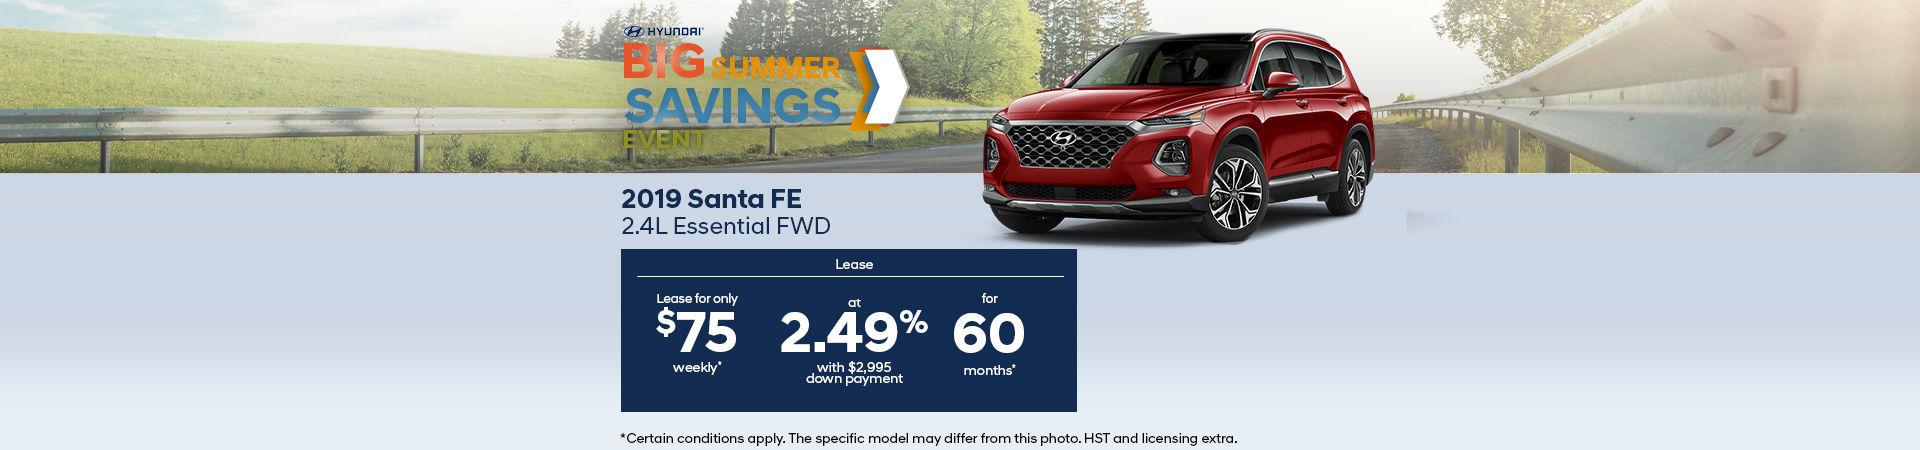 Get the 2019 Hyundai SantaFe